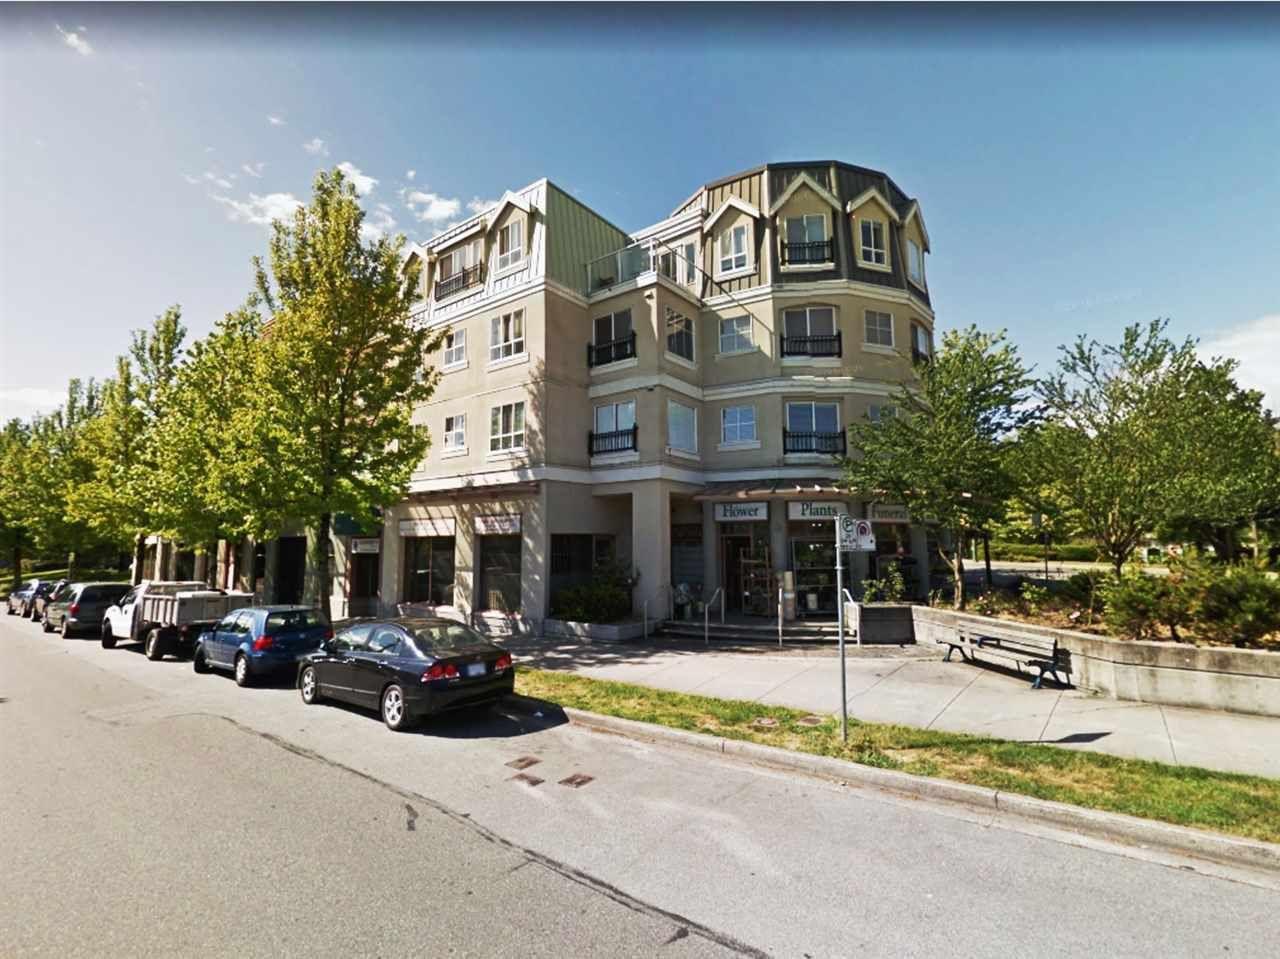 "Main Photo: E313 515 E 15TH Avenue in Vancouver: Mount Pleasant VE Condo for sale in ""HARVARD PLACE"" (Vancouver East)  : MLS®# R2372381"